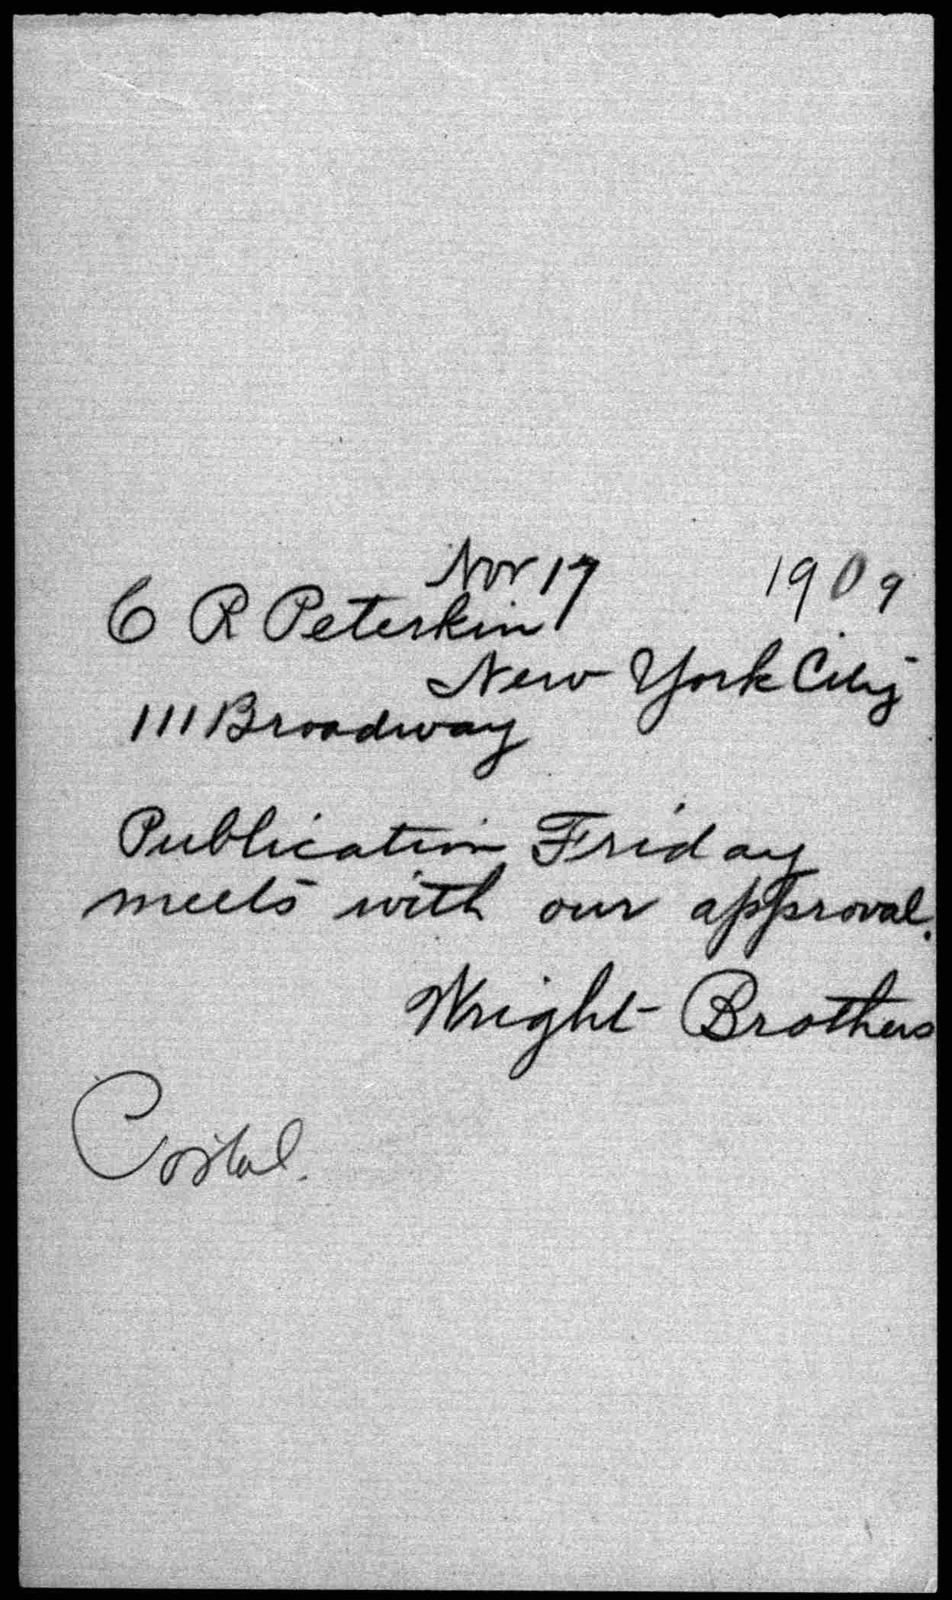 General Correspondence:  Peterkin, Clinton R., 1909-1910, 1931, undated